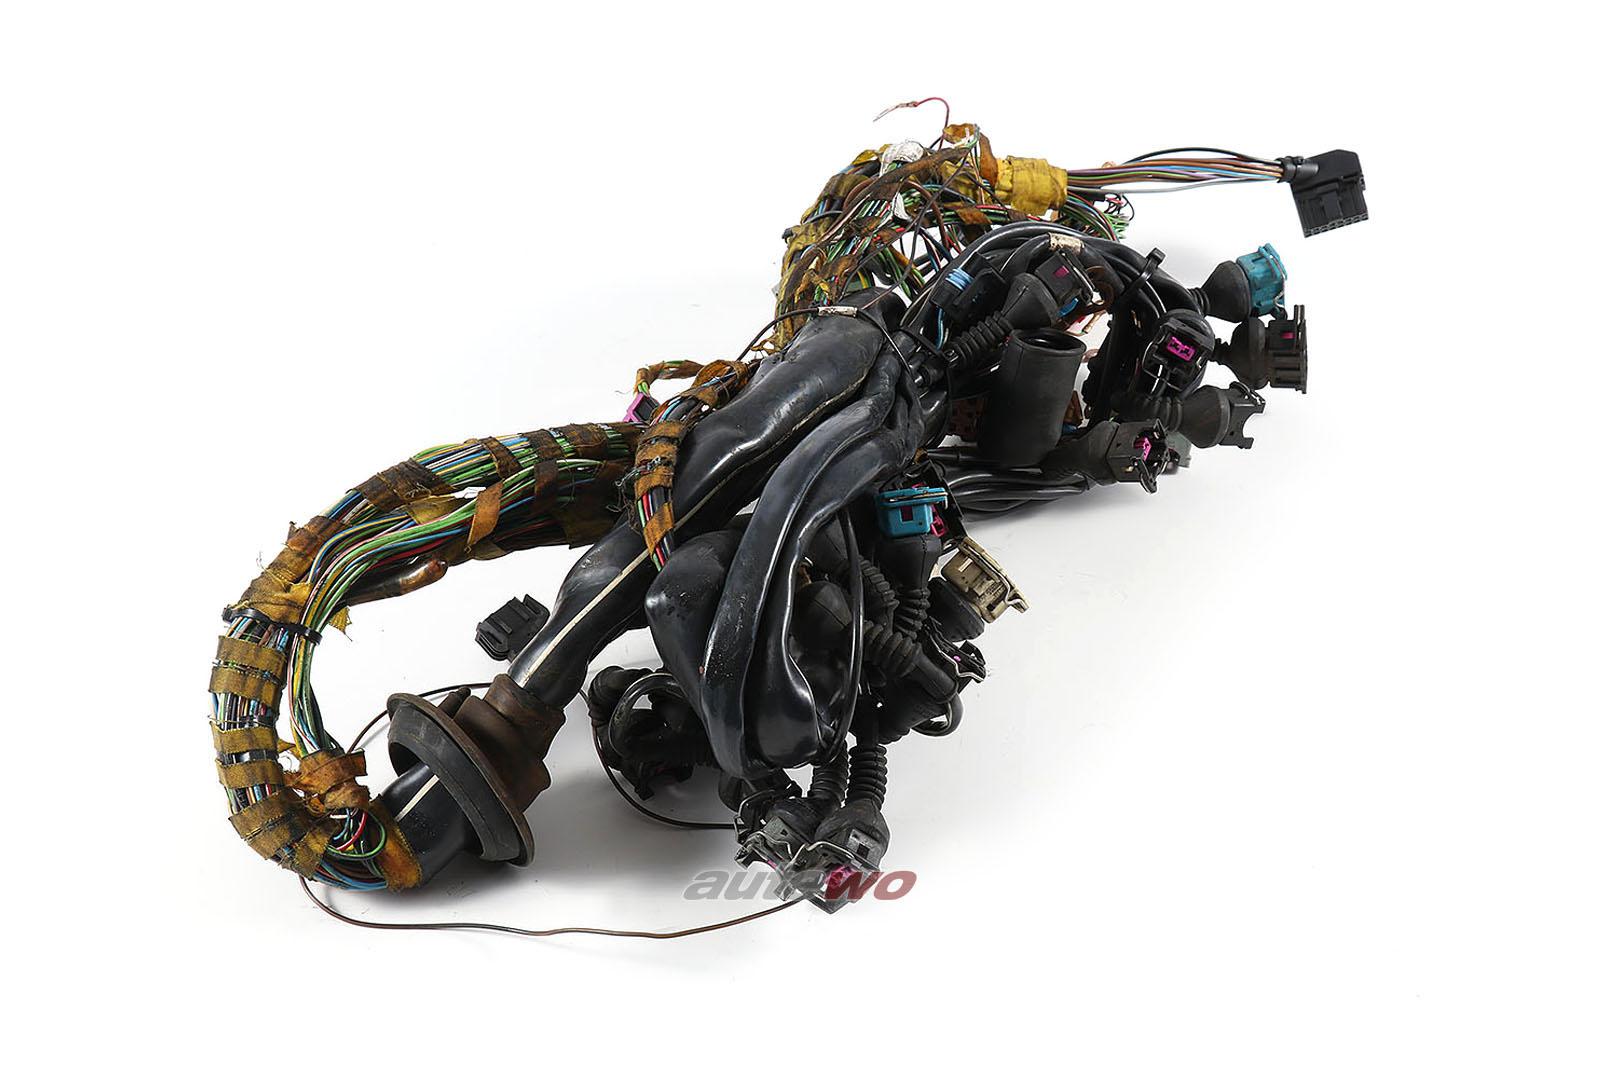 4A1971072JM Audi A6 C4 2.6l V6 ABC Motorkabelbaum Schaltgetriebe